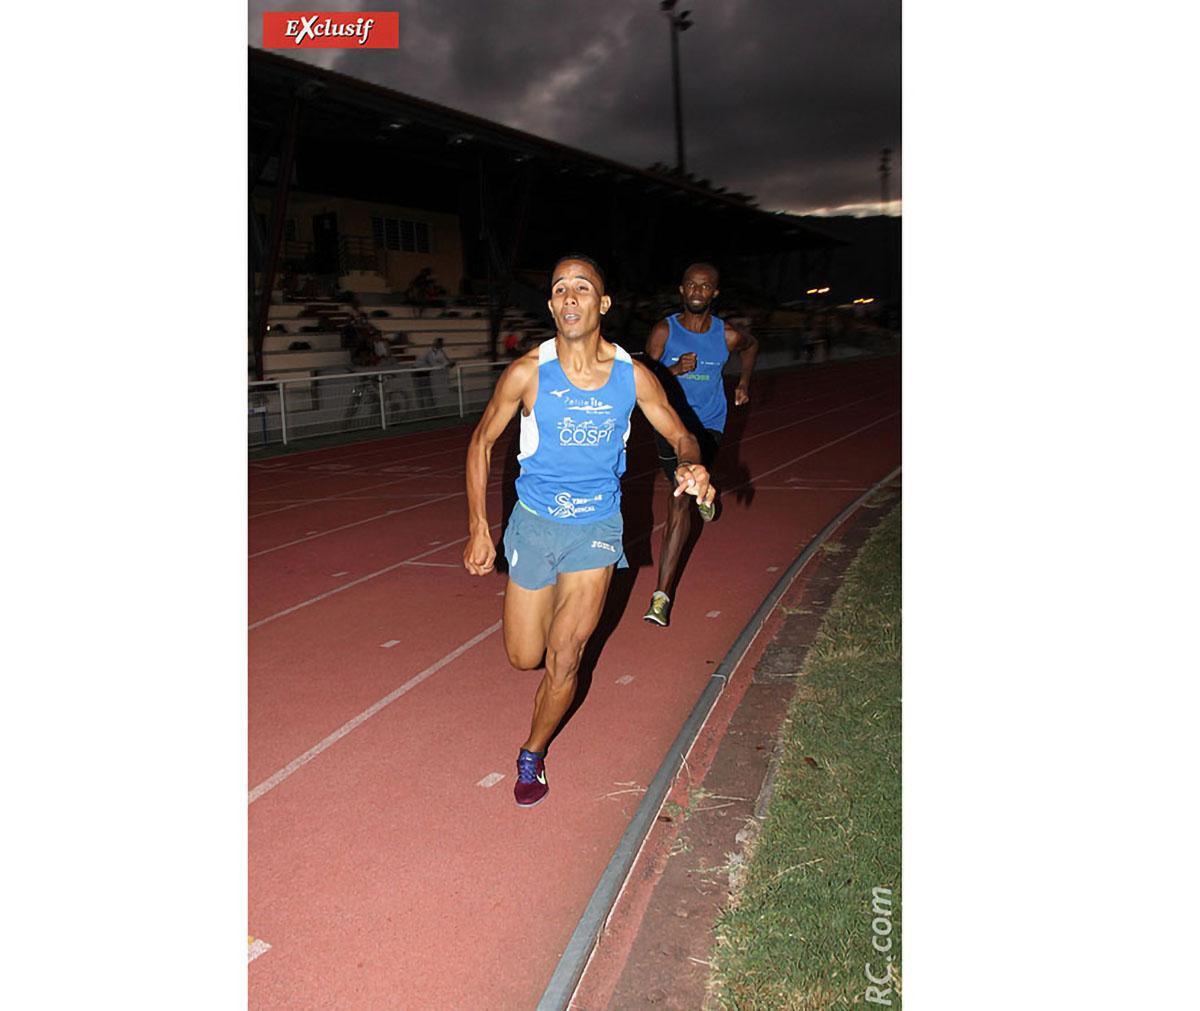 Le duo Didier Barret/Mohamed Houssamoudine en tête du 3000 m